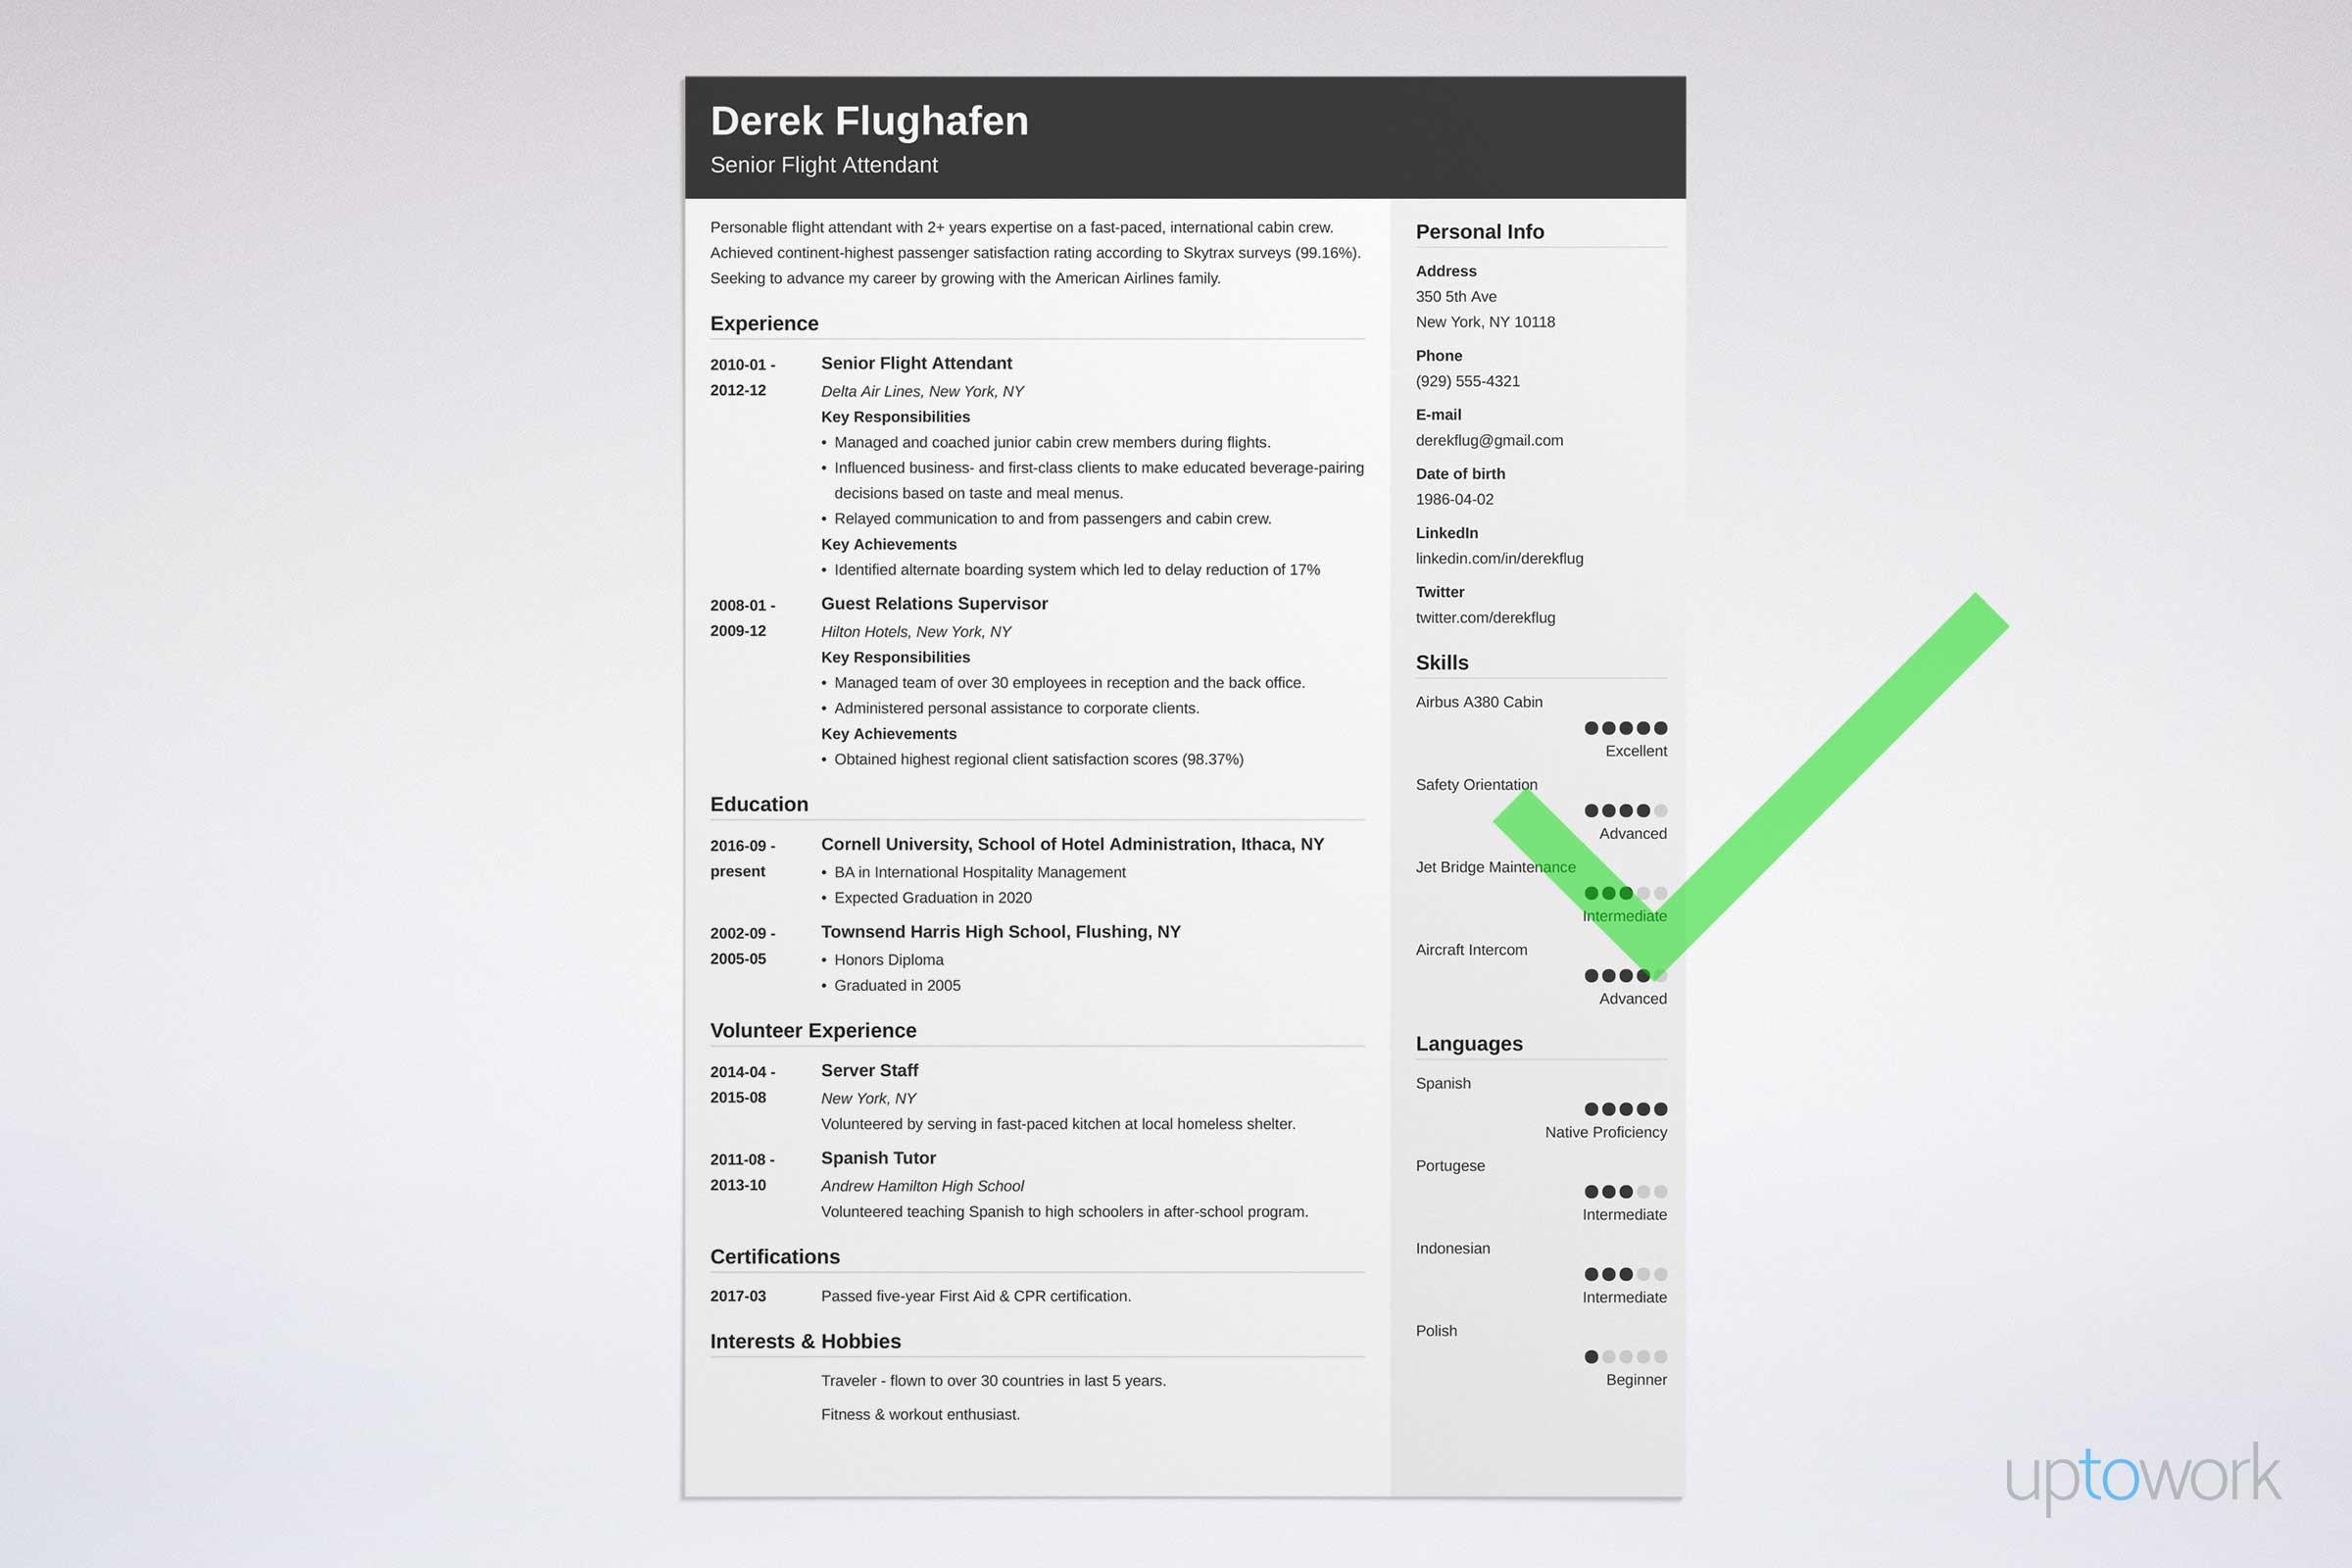 Advertisement sample resume skills for ojt tourism